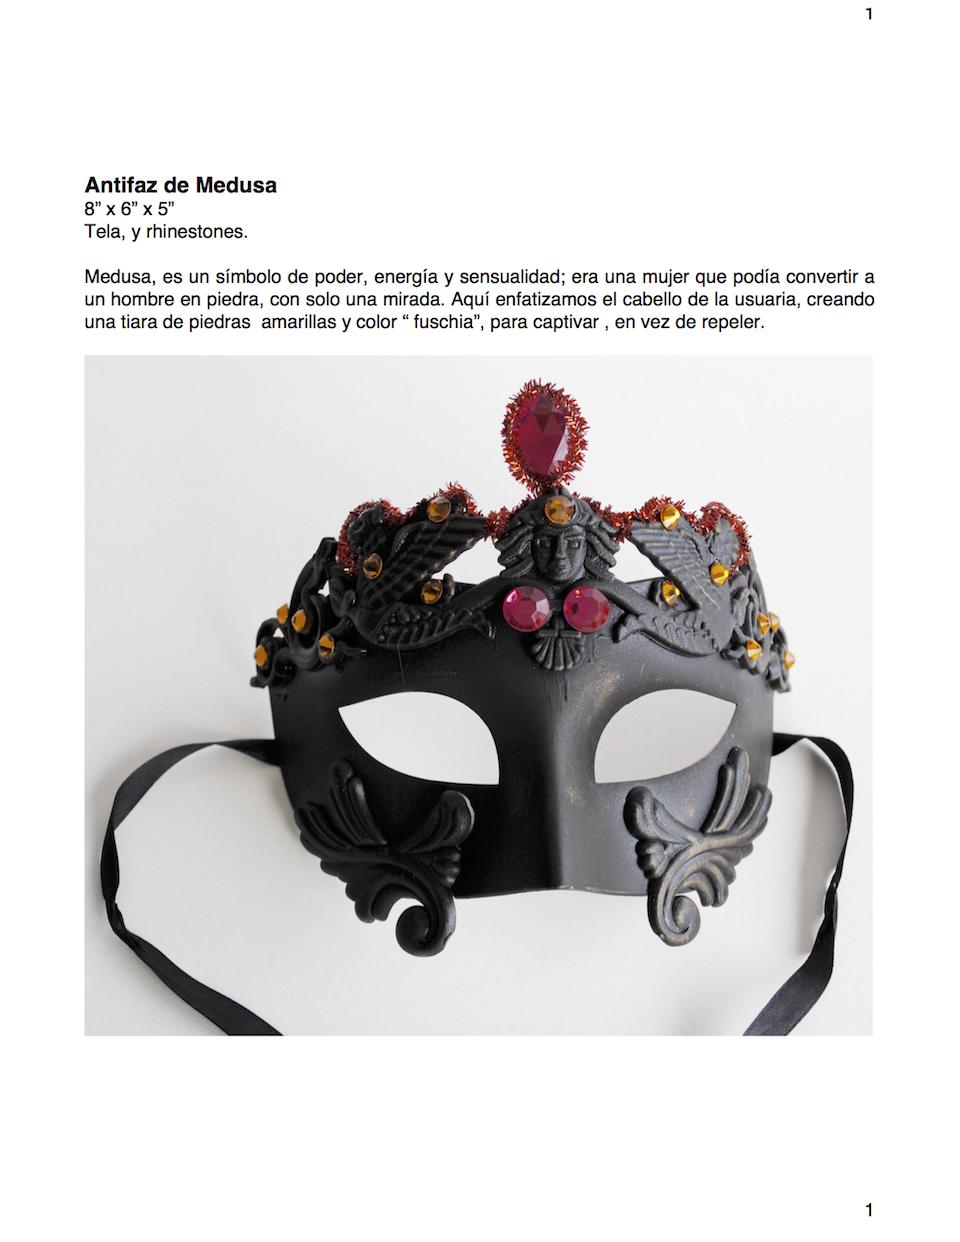 Antifaz Medusa, Ficha Técnica